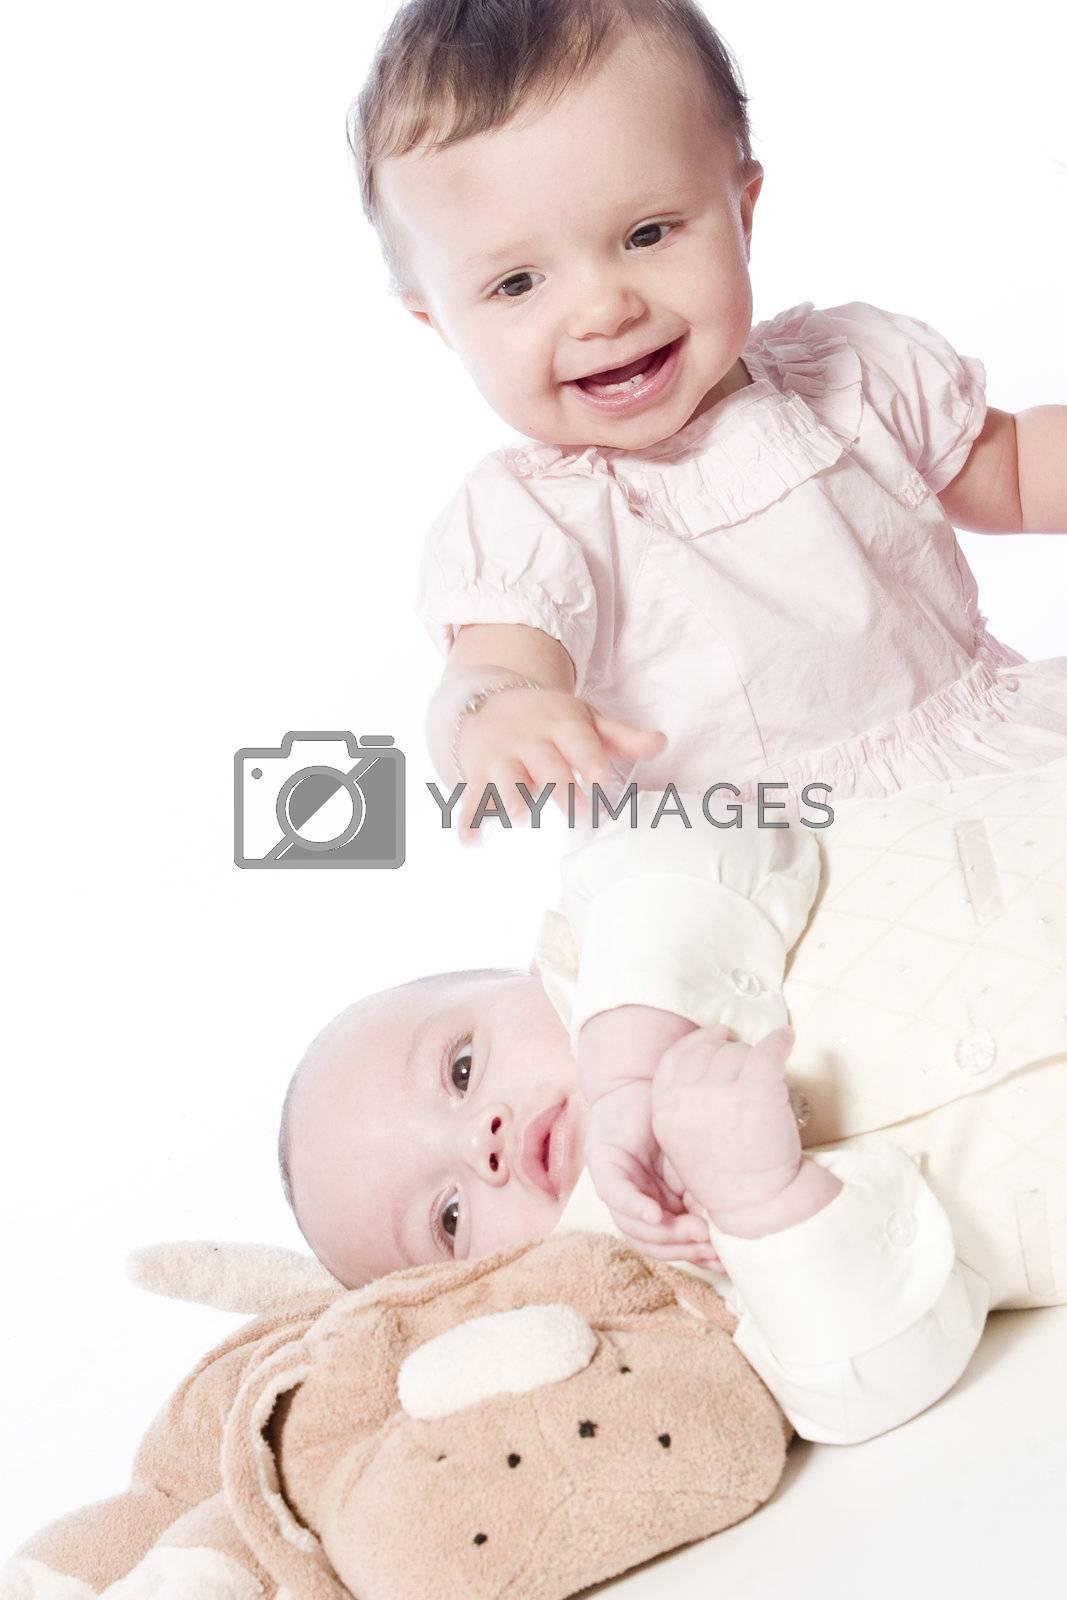 little children portraits taken in the studio on a white background